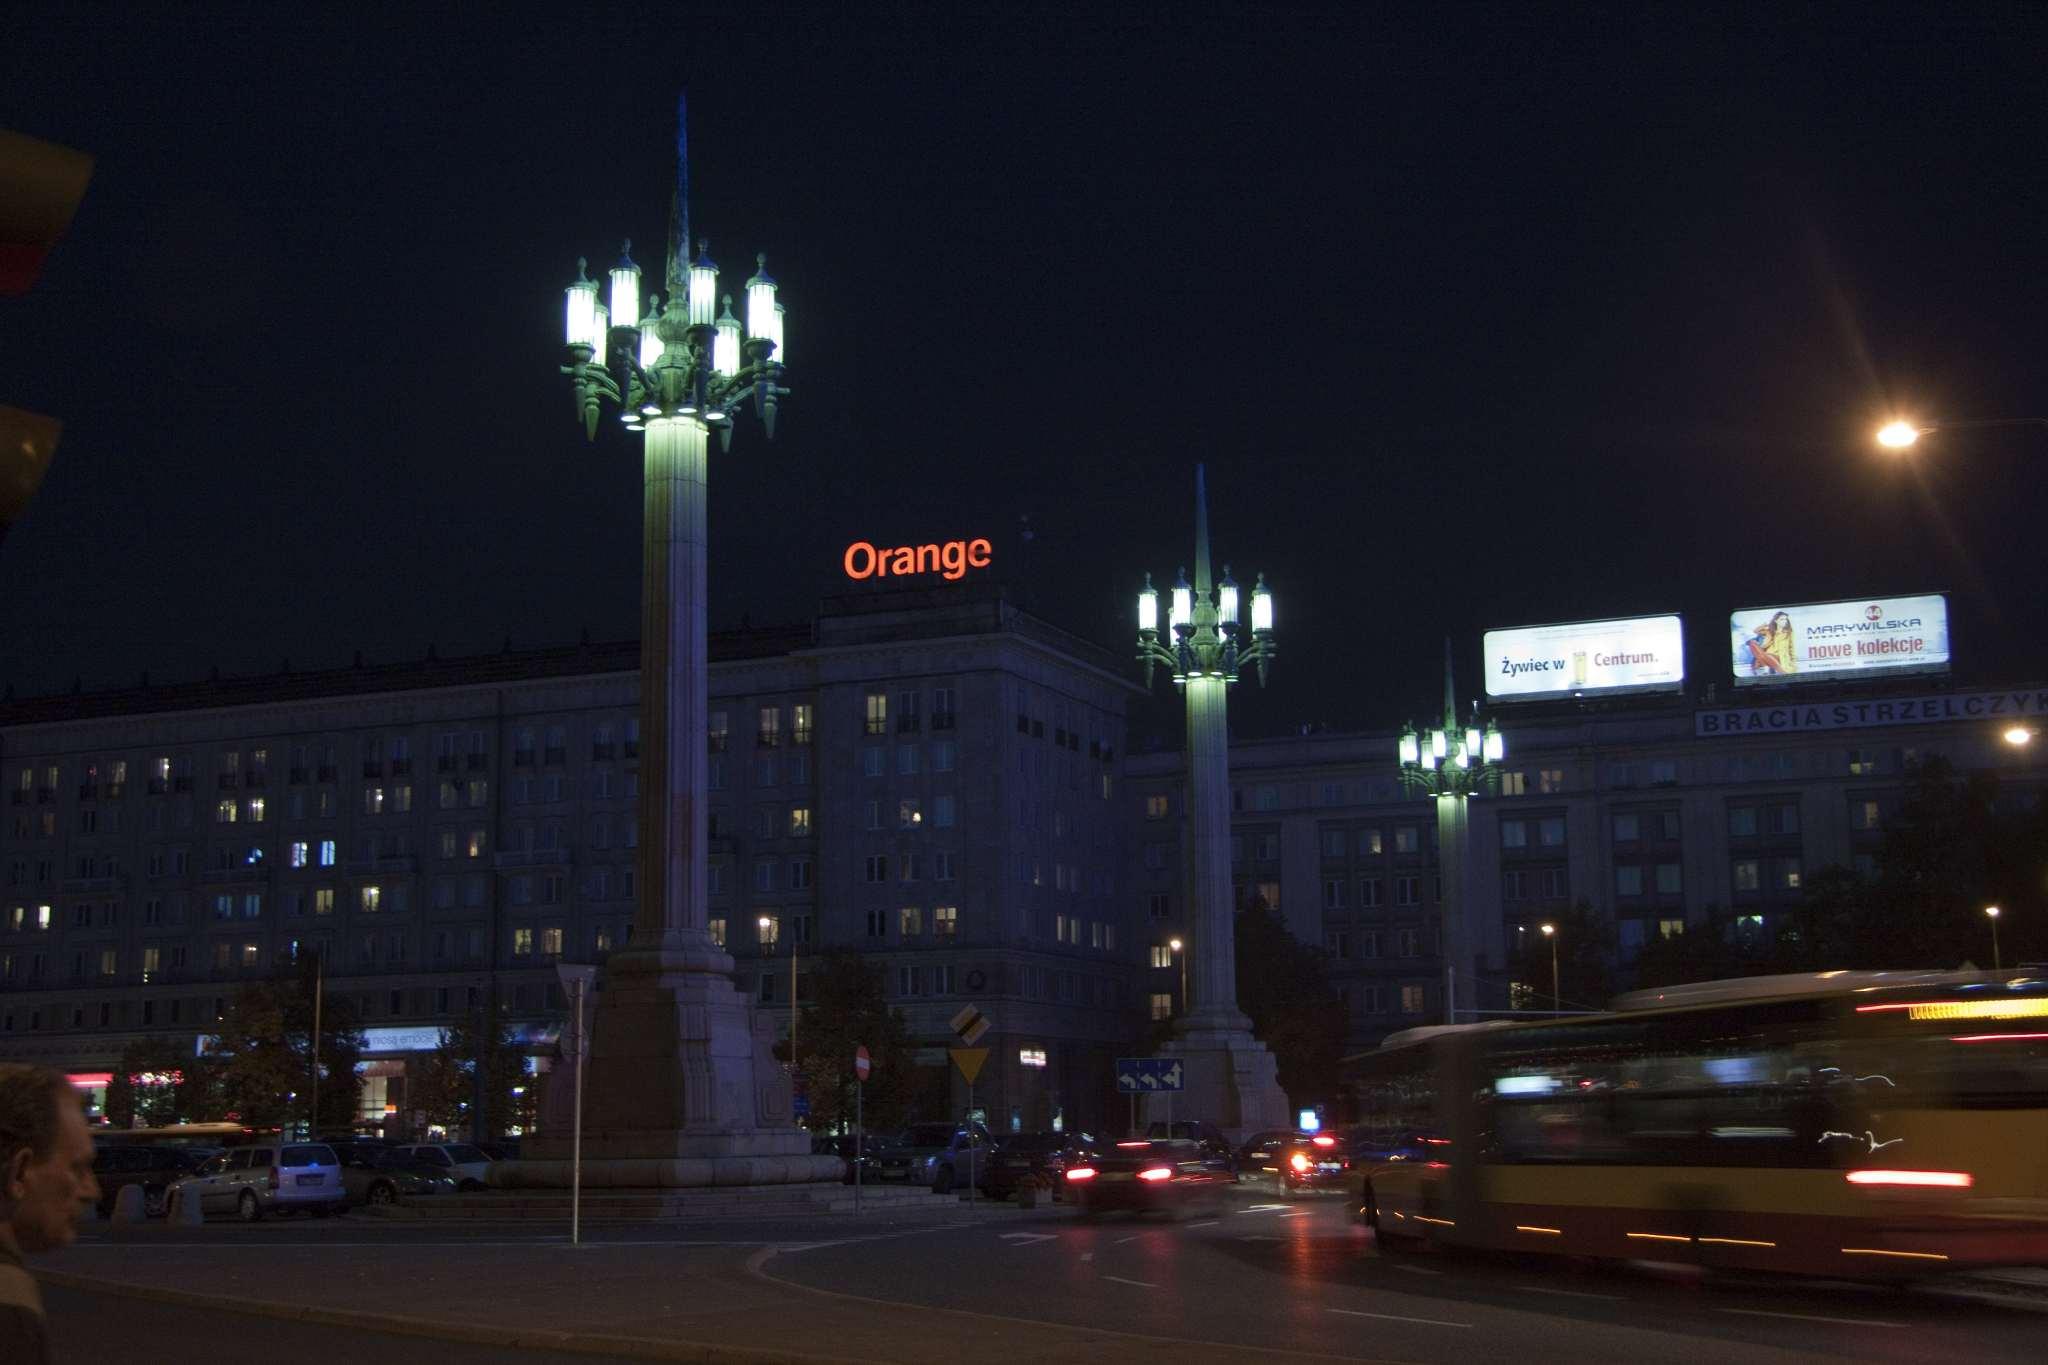 Giant streetlights